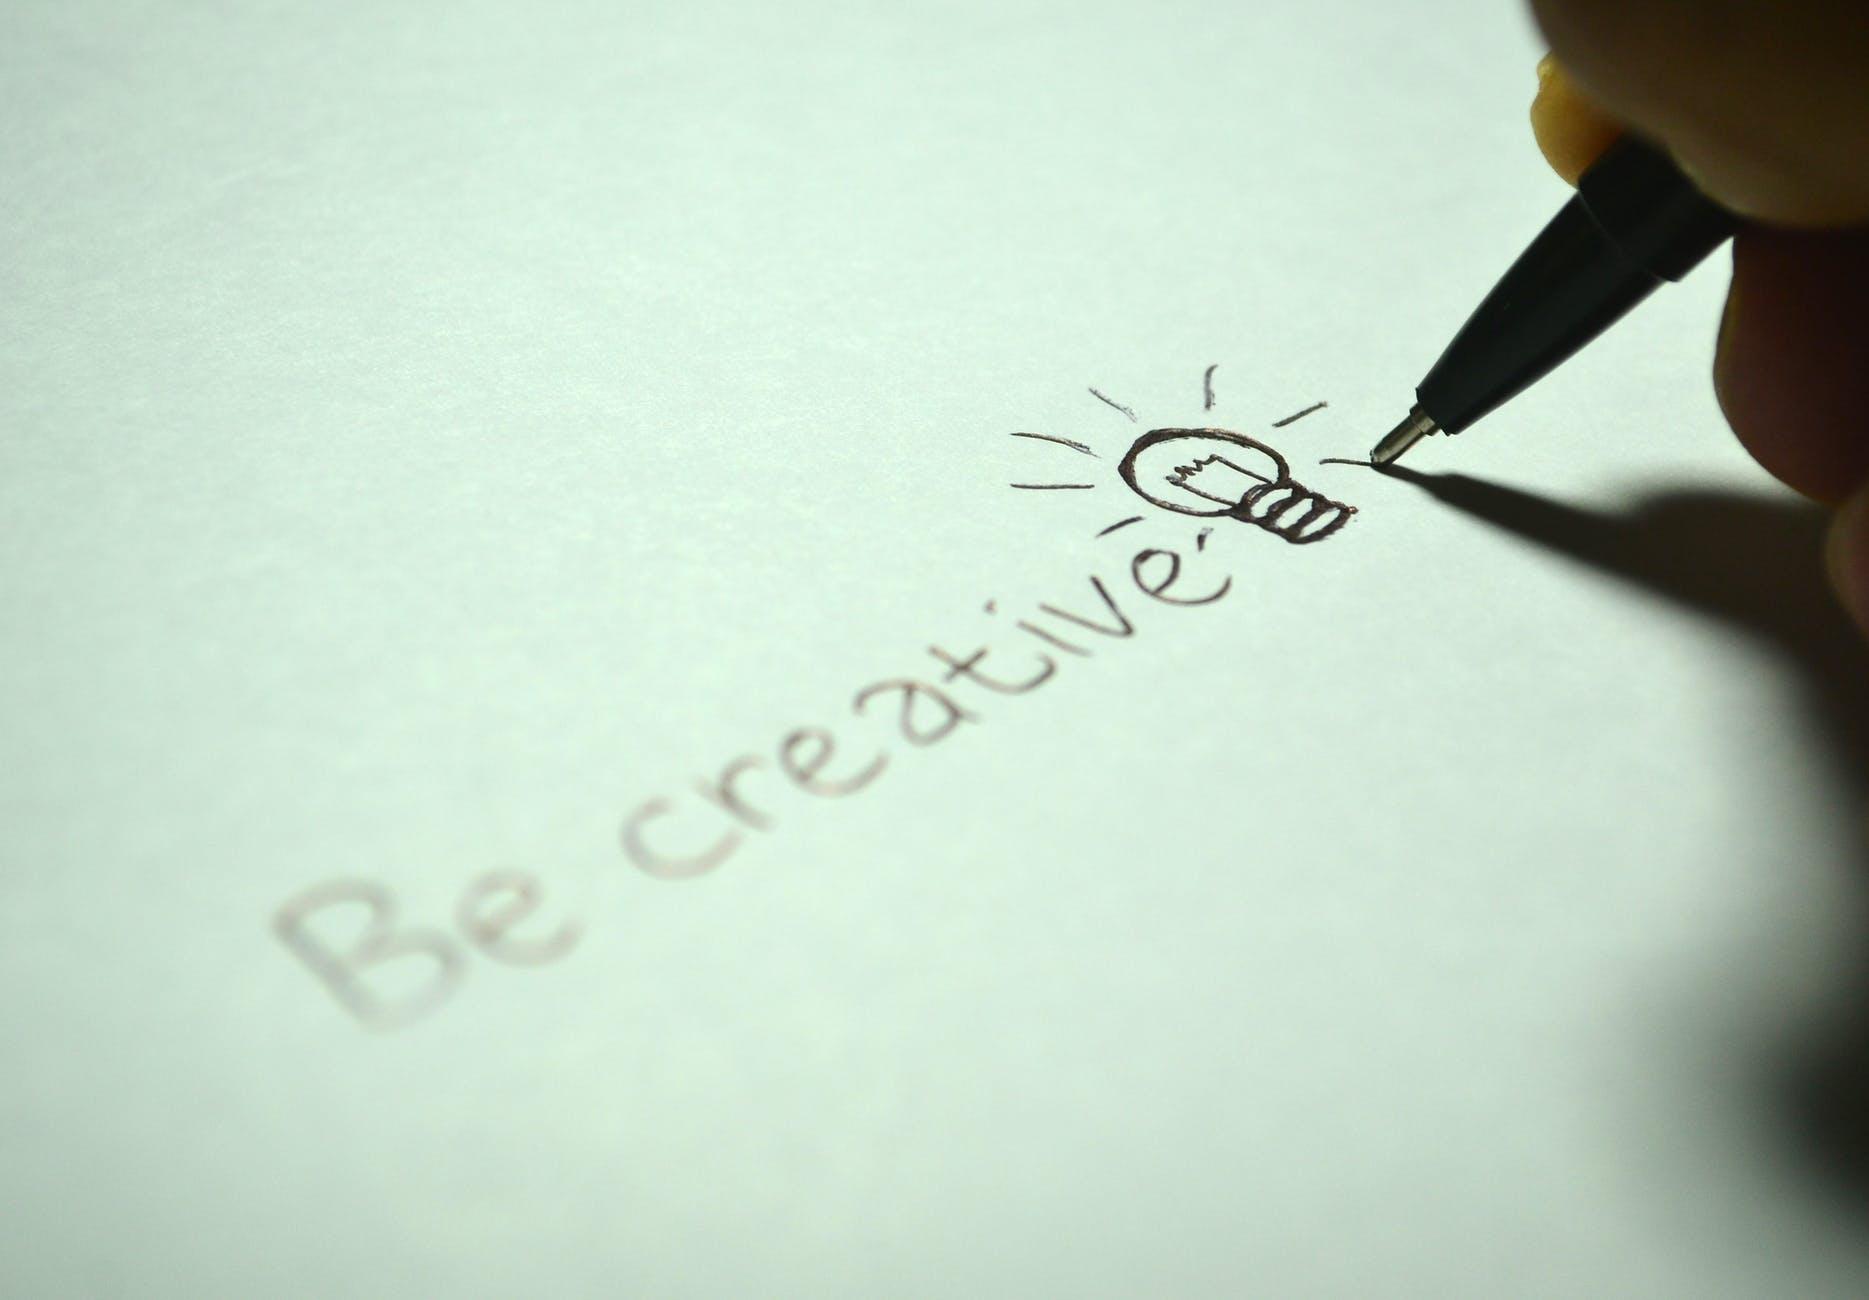 Be crreative written on a sheet